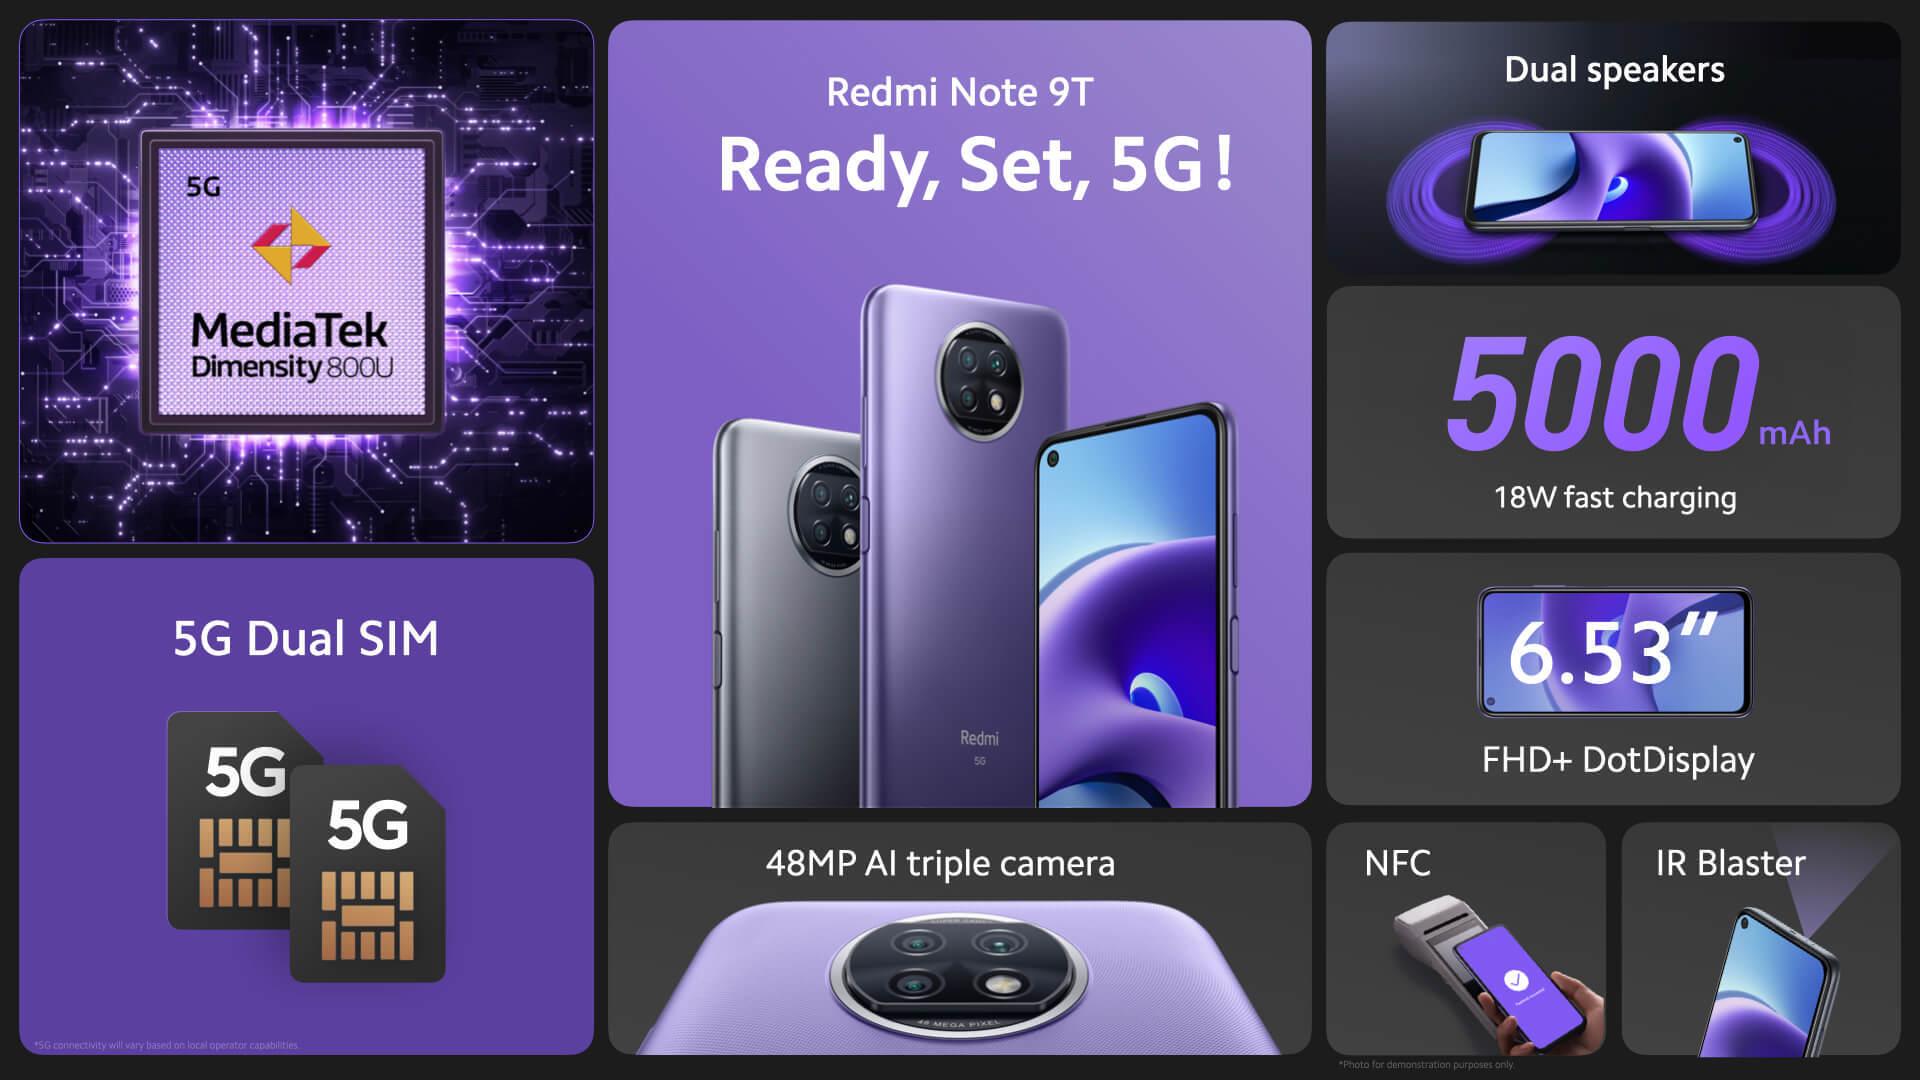 Redmi Note 9T 5G. 0